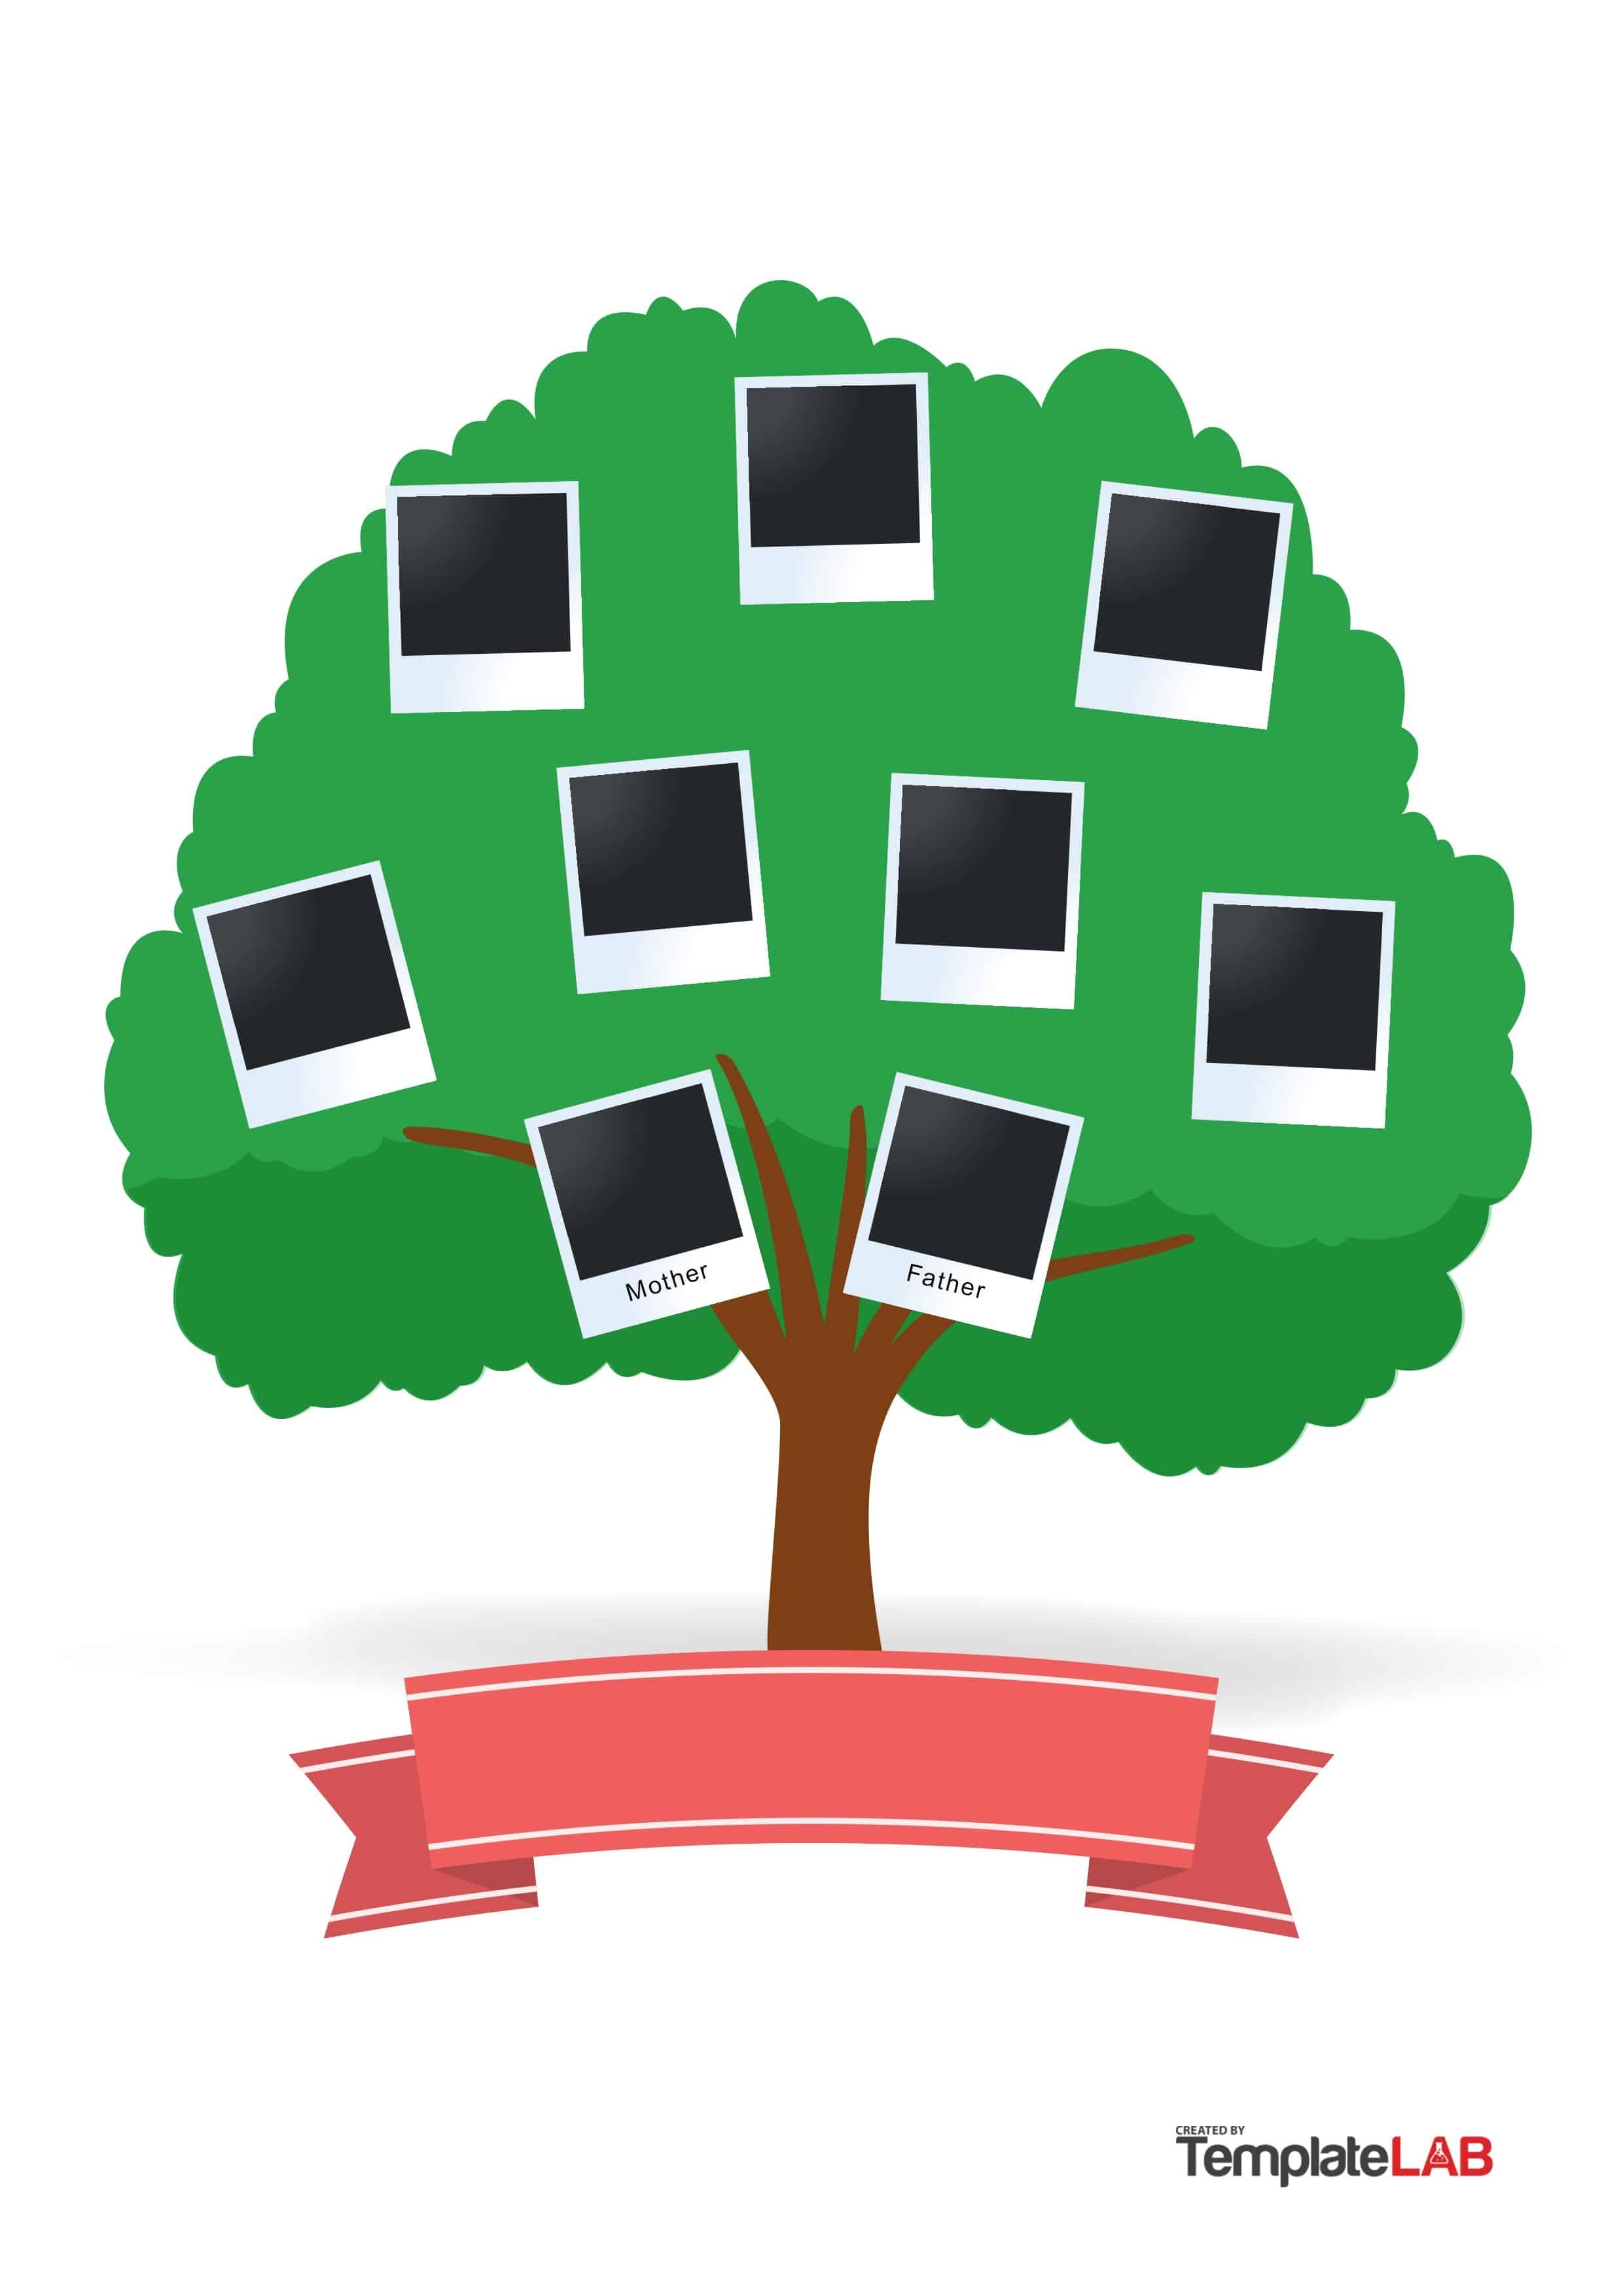 50+ Free Family Tree Templates (Word, Excel, Pdf) ᐅ Template Lab - Free Printable Family Tree Template